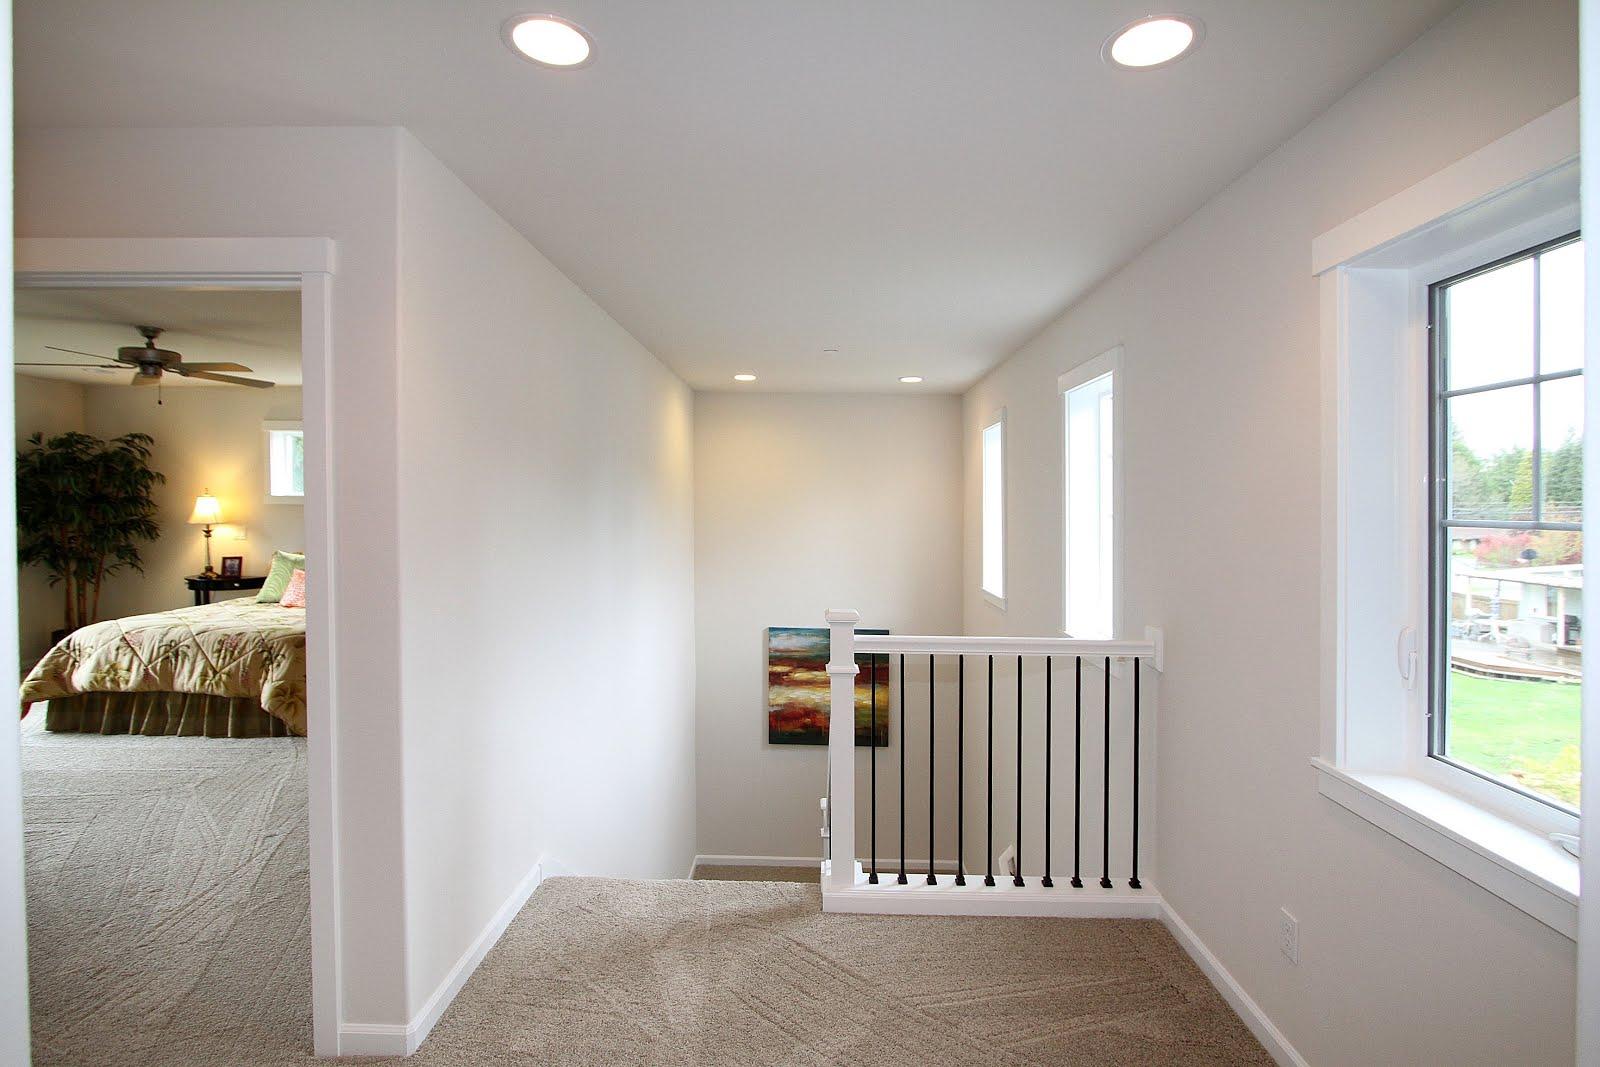 013_Upstairs.jpg